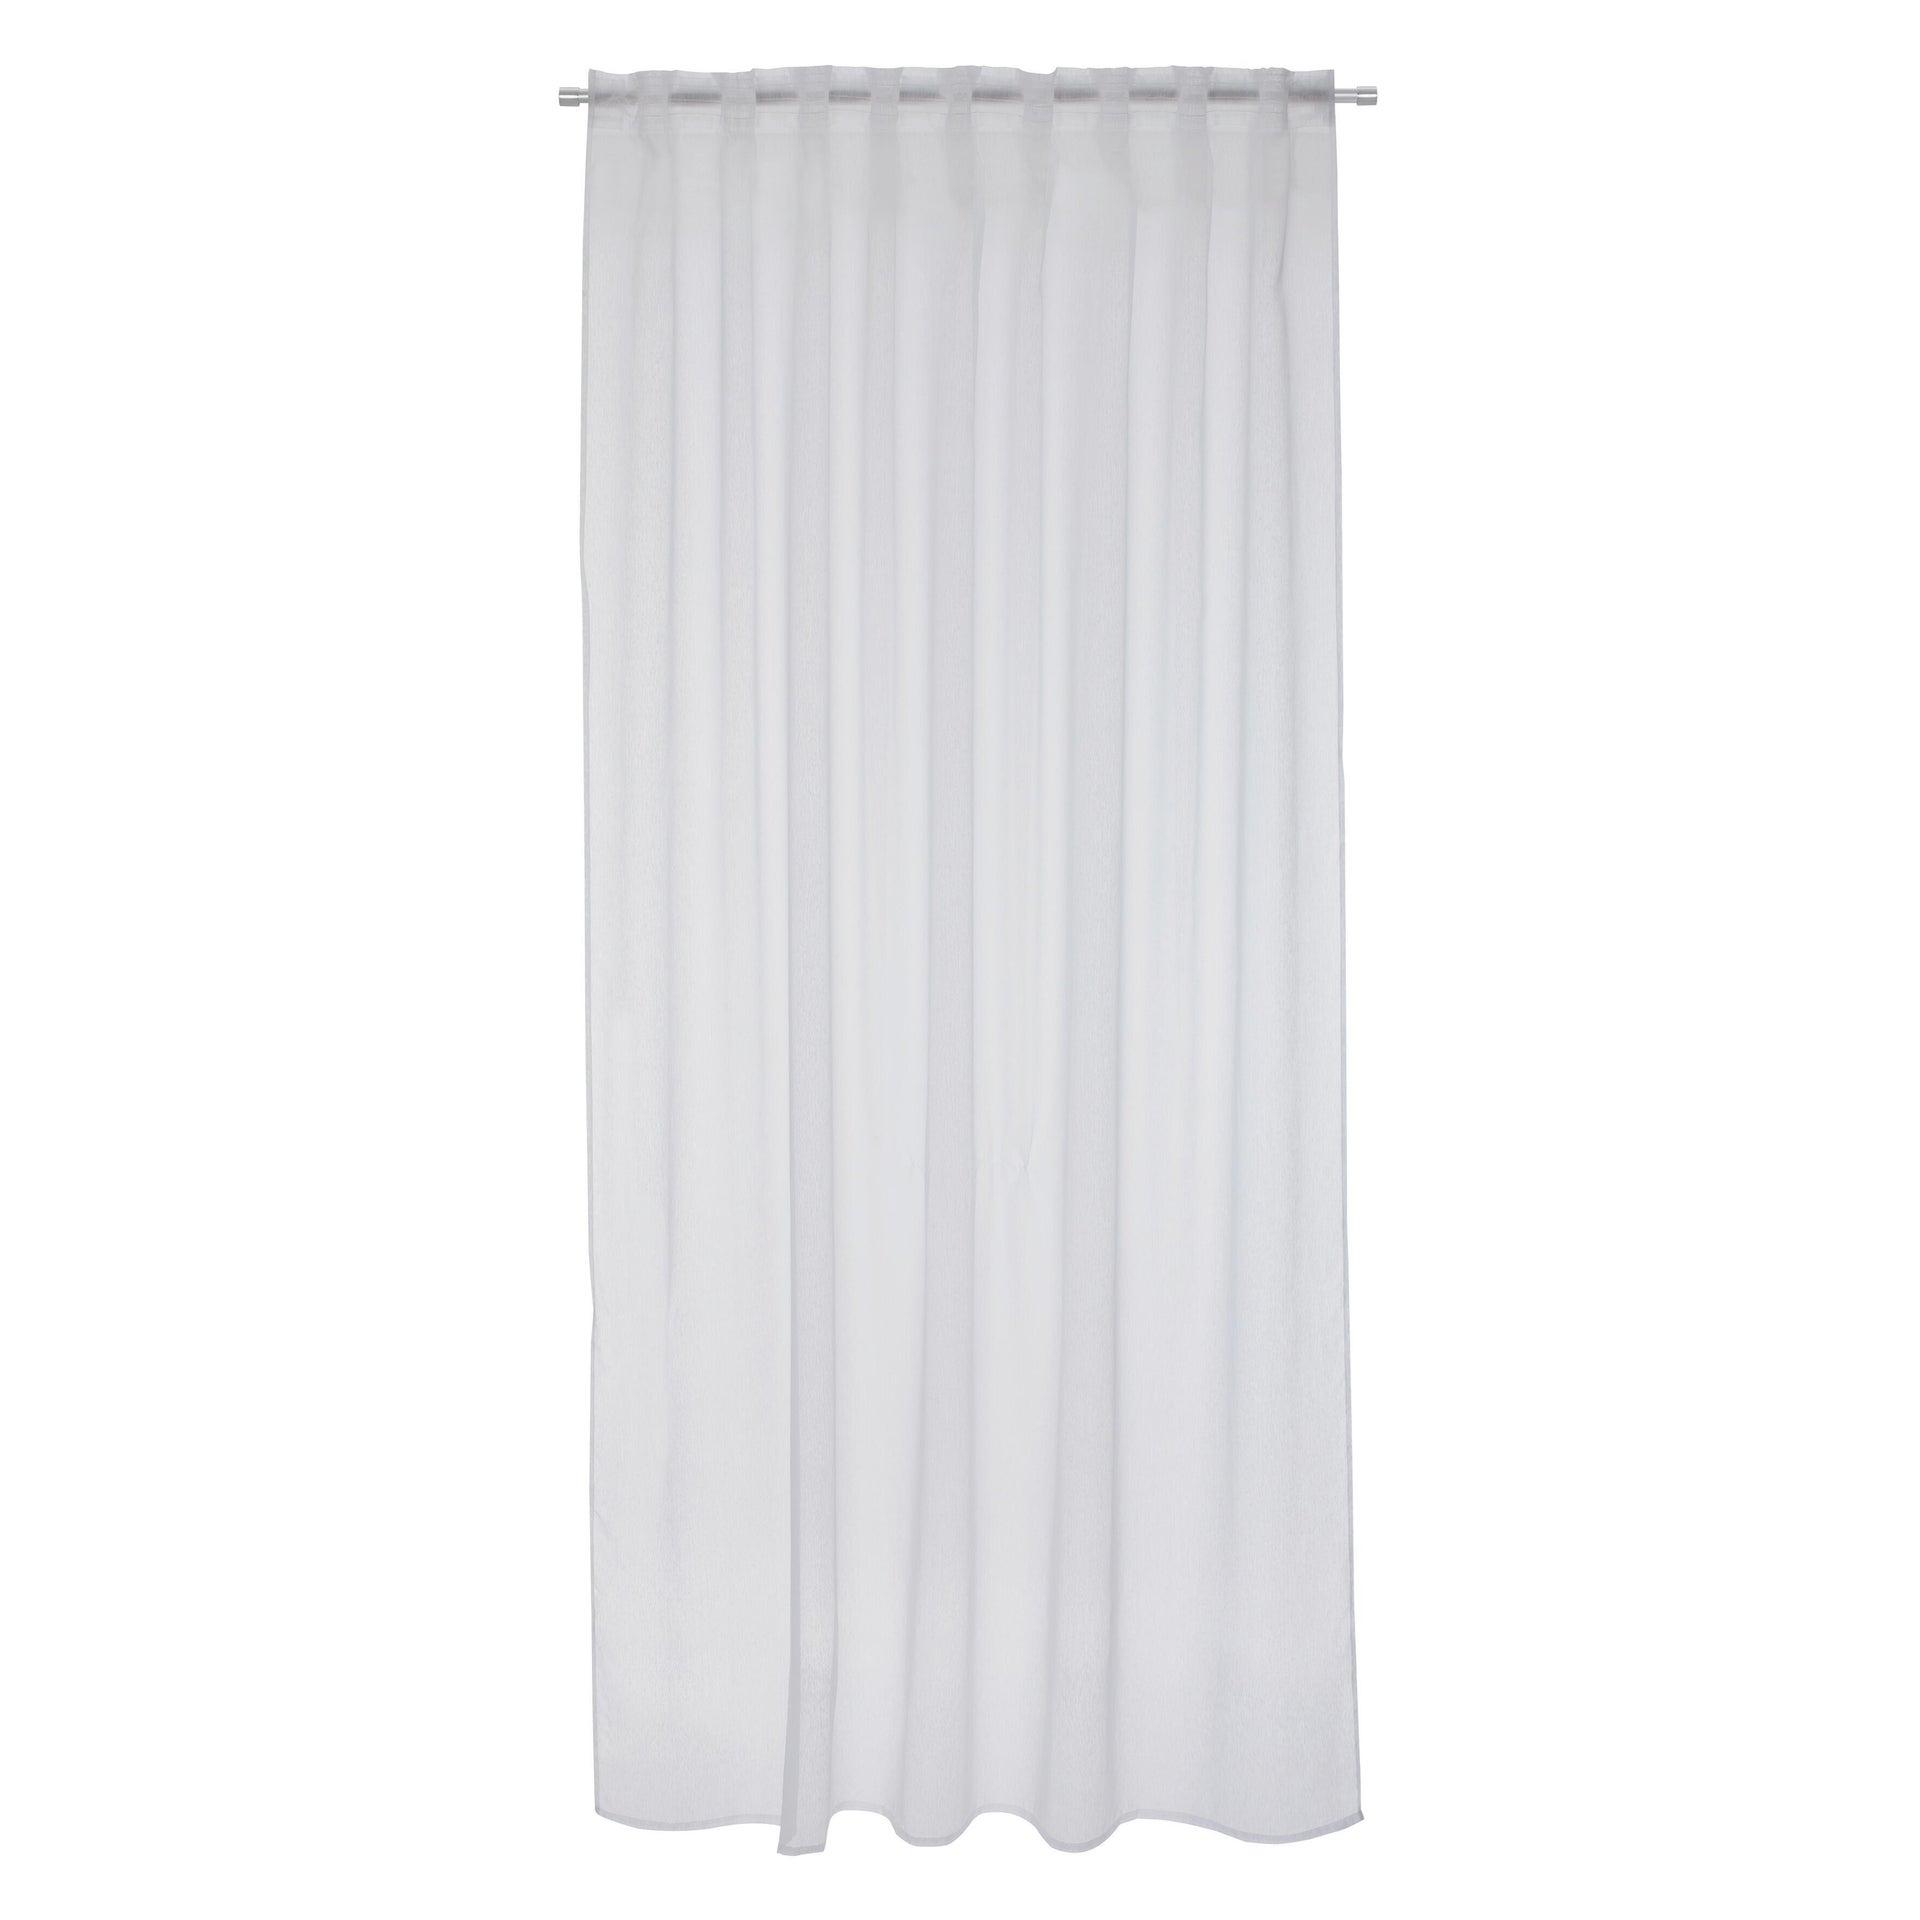 Tenda INSPIRE Softy bianco fettuccia e passanti 200 x 280 cm - 2